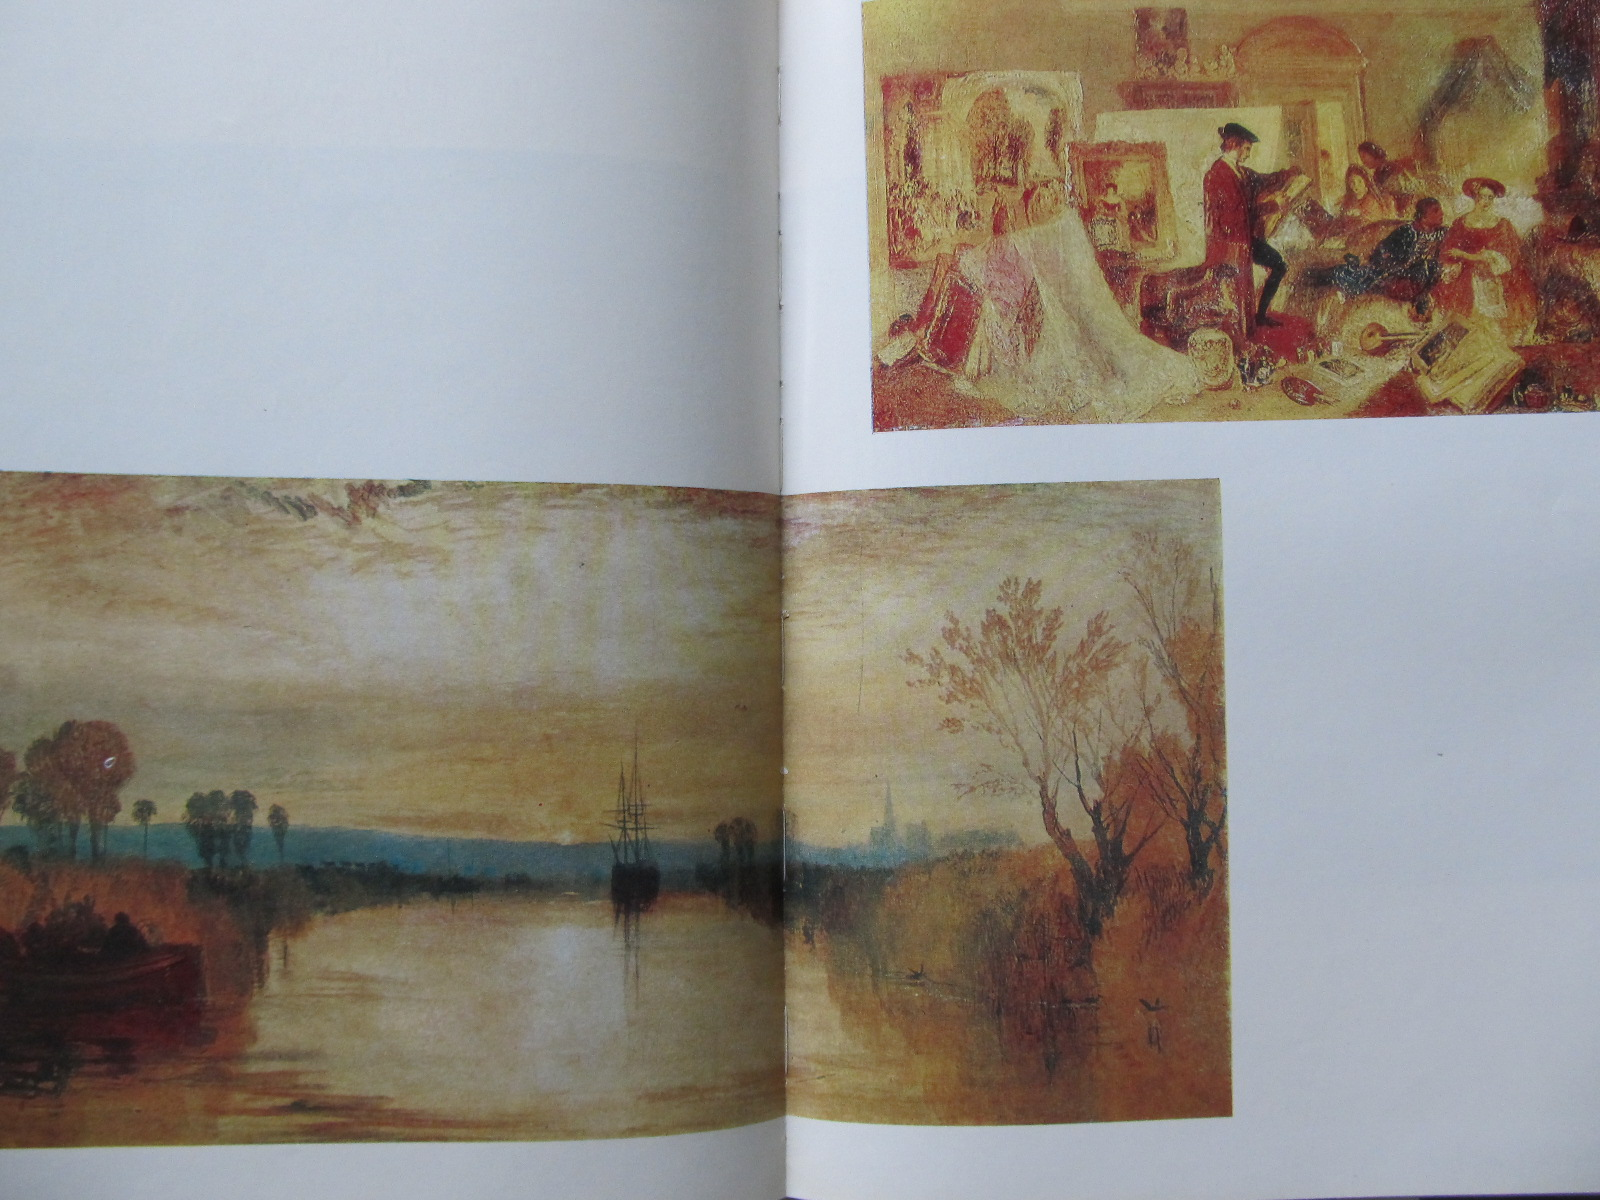 Carte Turner (Album) - format foarte mare - Vasile Nicolescu